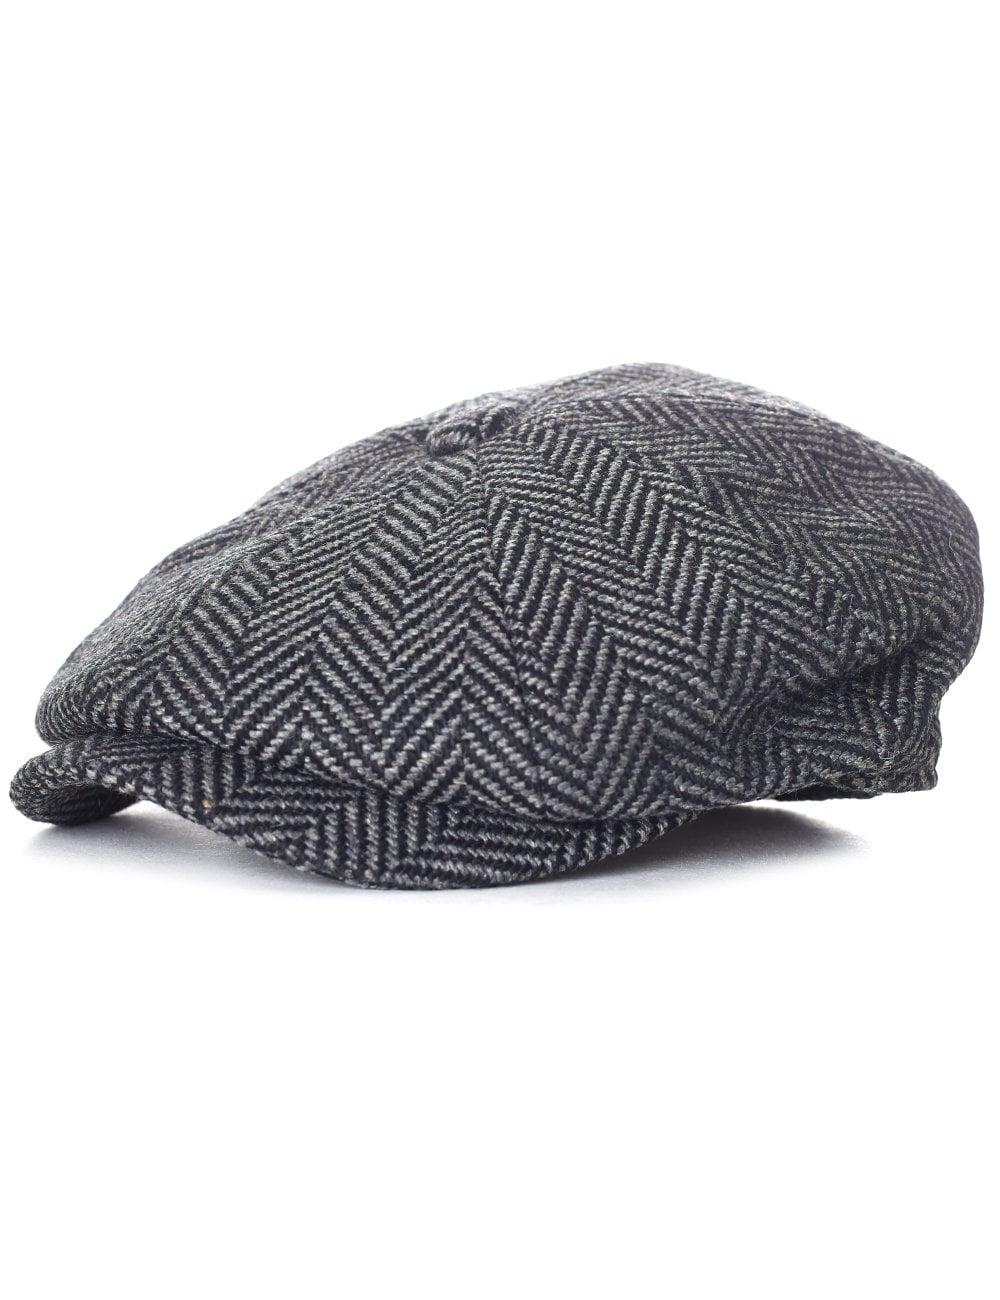 cf49cbd3e66 Barbour Men s Herringbone Bakerboy Hat